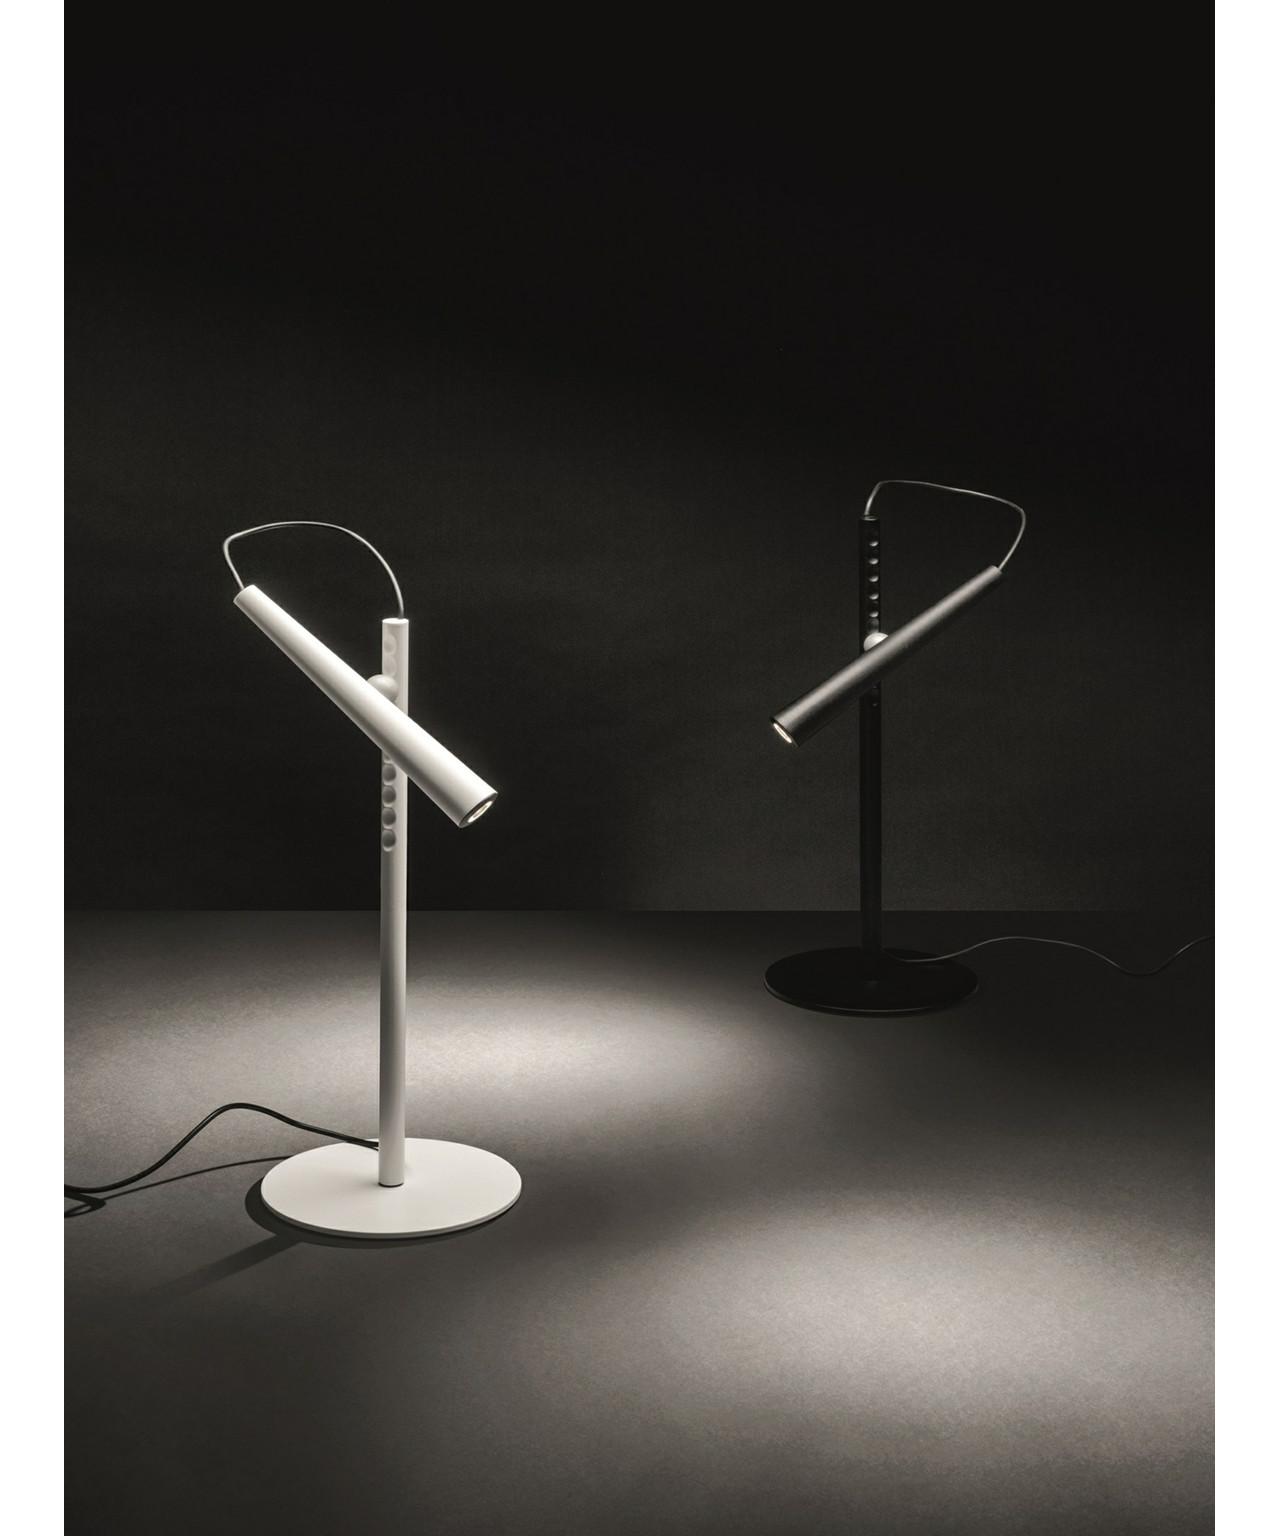 magneto tischleuchte wei foscarini. Black Bedroom Furniture Sets. Home Design Ideas